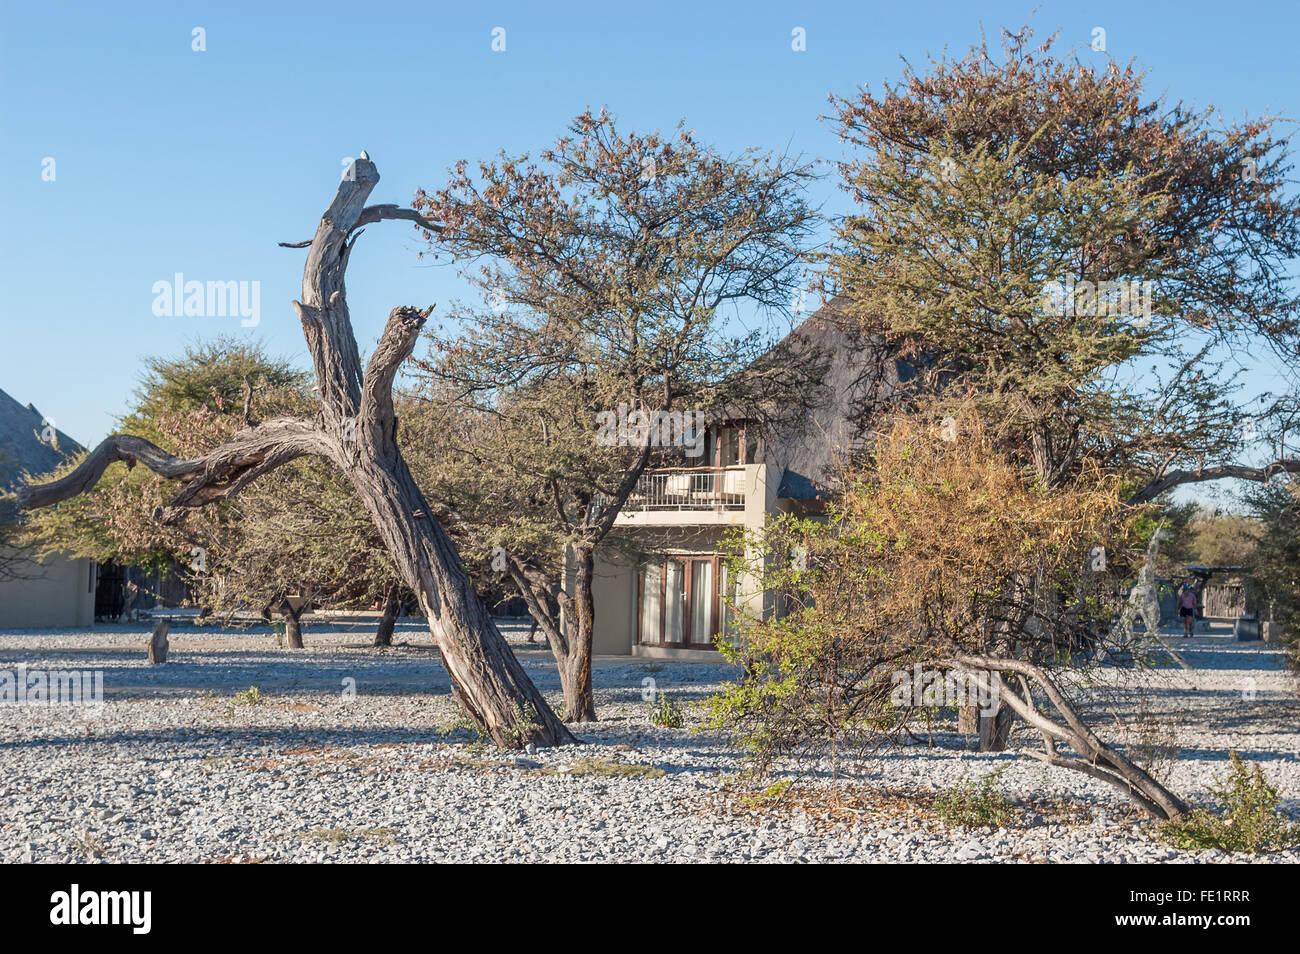 OKAUKEUJO, NAMIBIA - JUNE 12, 2015: Luxury chalets next to the waterhole in the Okaukeujo Rest Camp, Etosha National - Stock Image